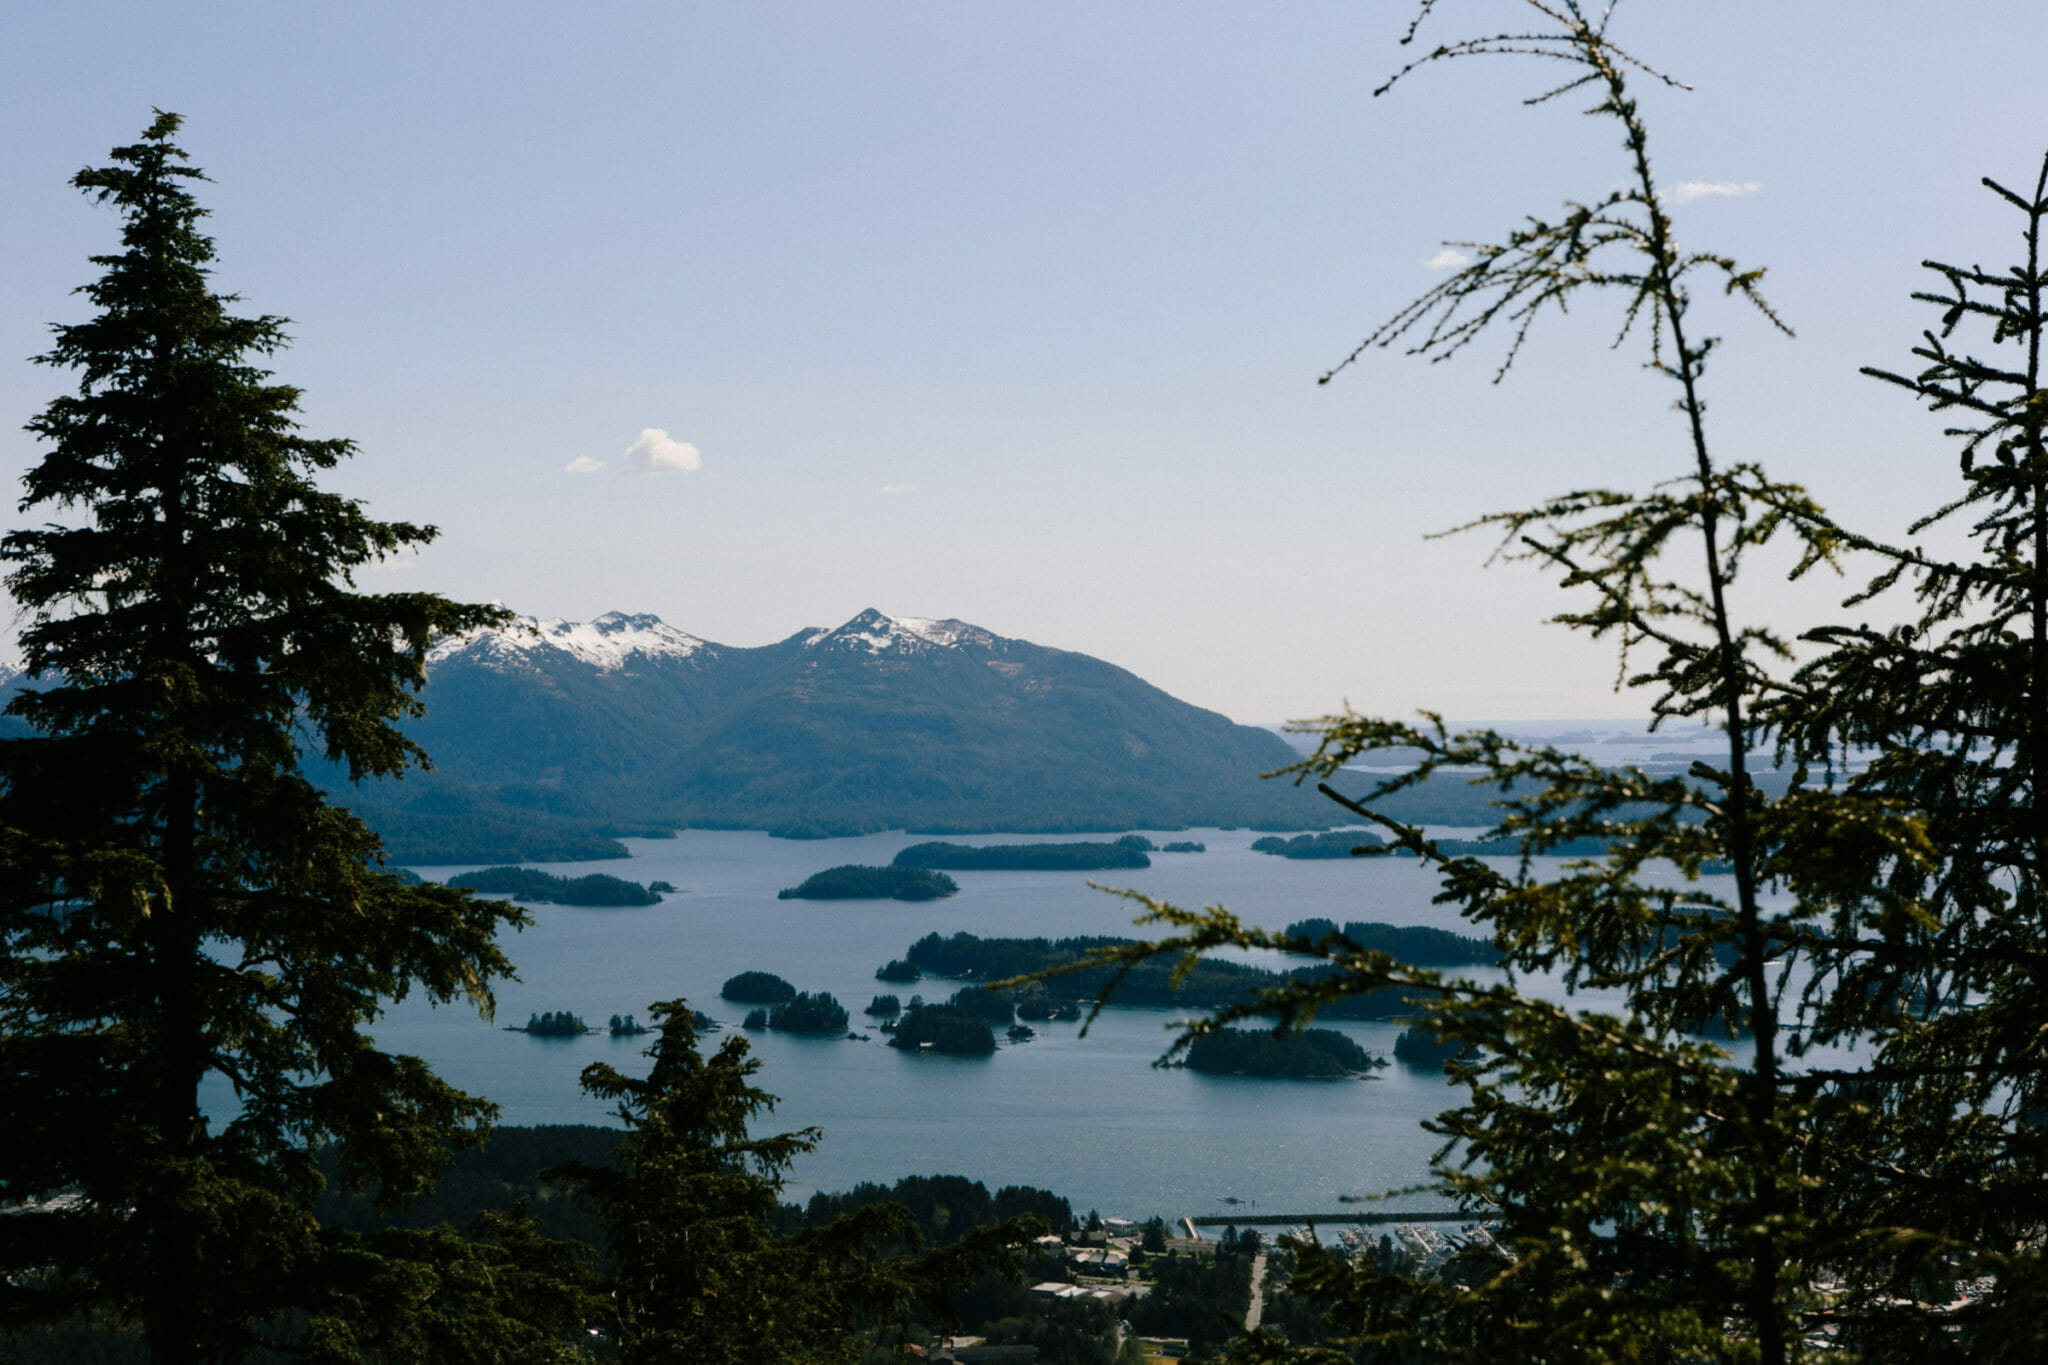 Scenic photo of mountains in Alaska